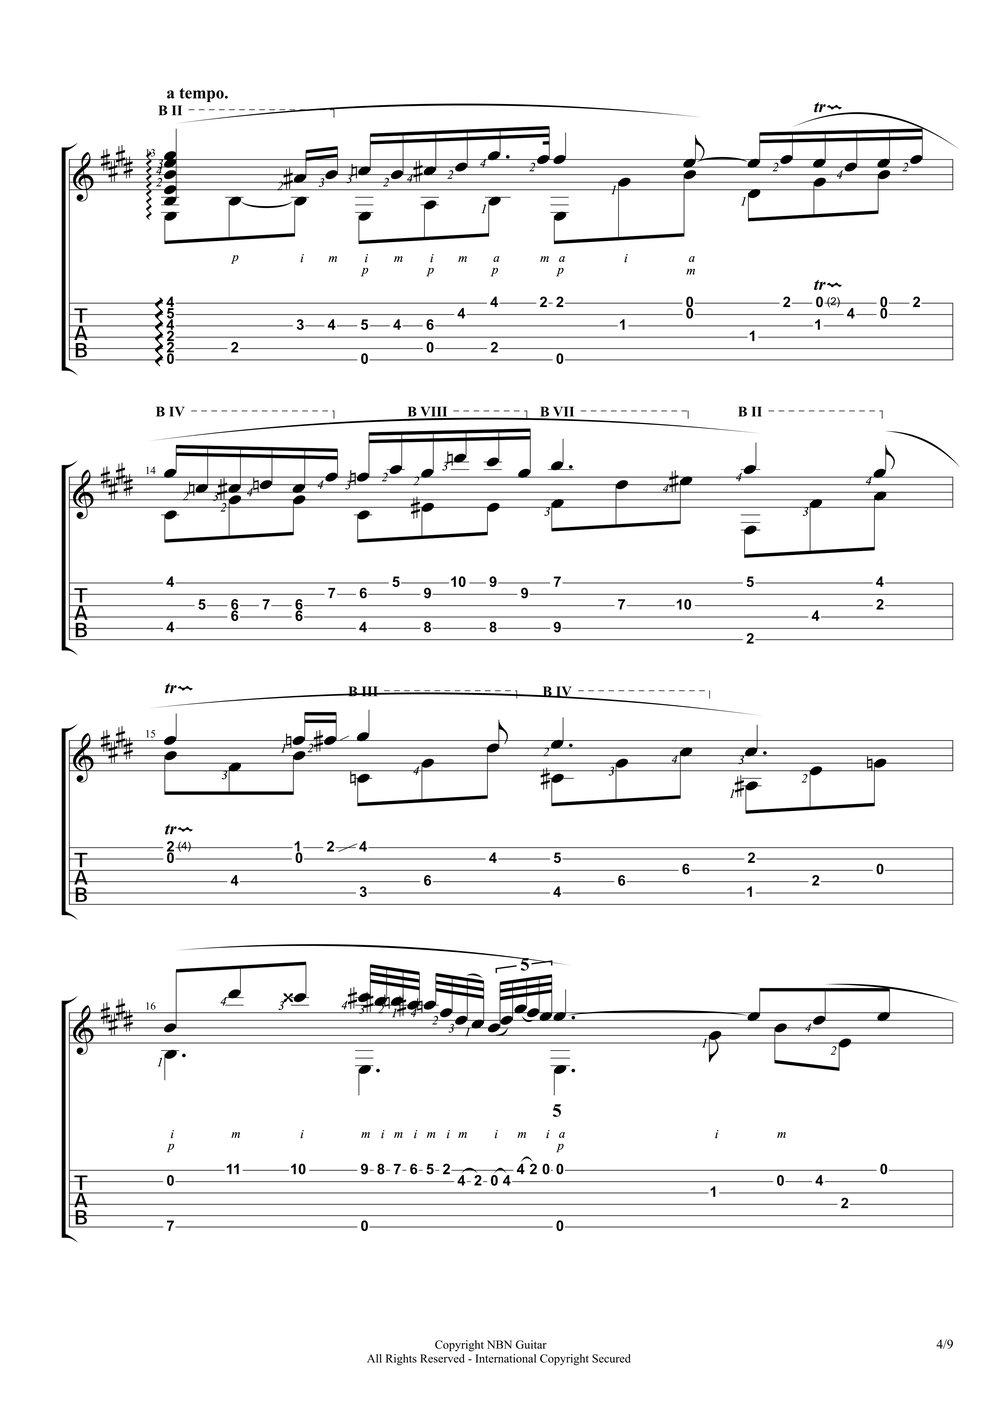 Nocturne in E-flat major (Sheet Music & Tabs)-p06.jpg